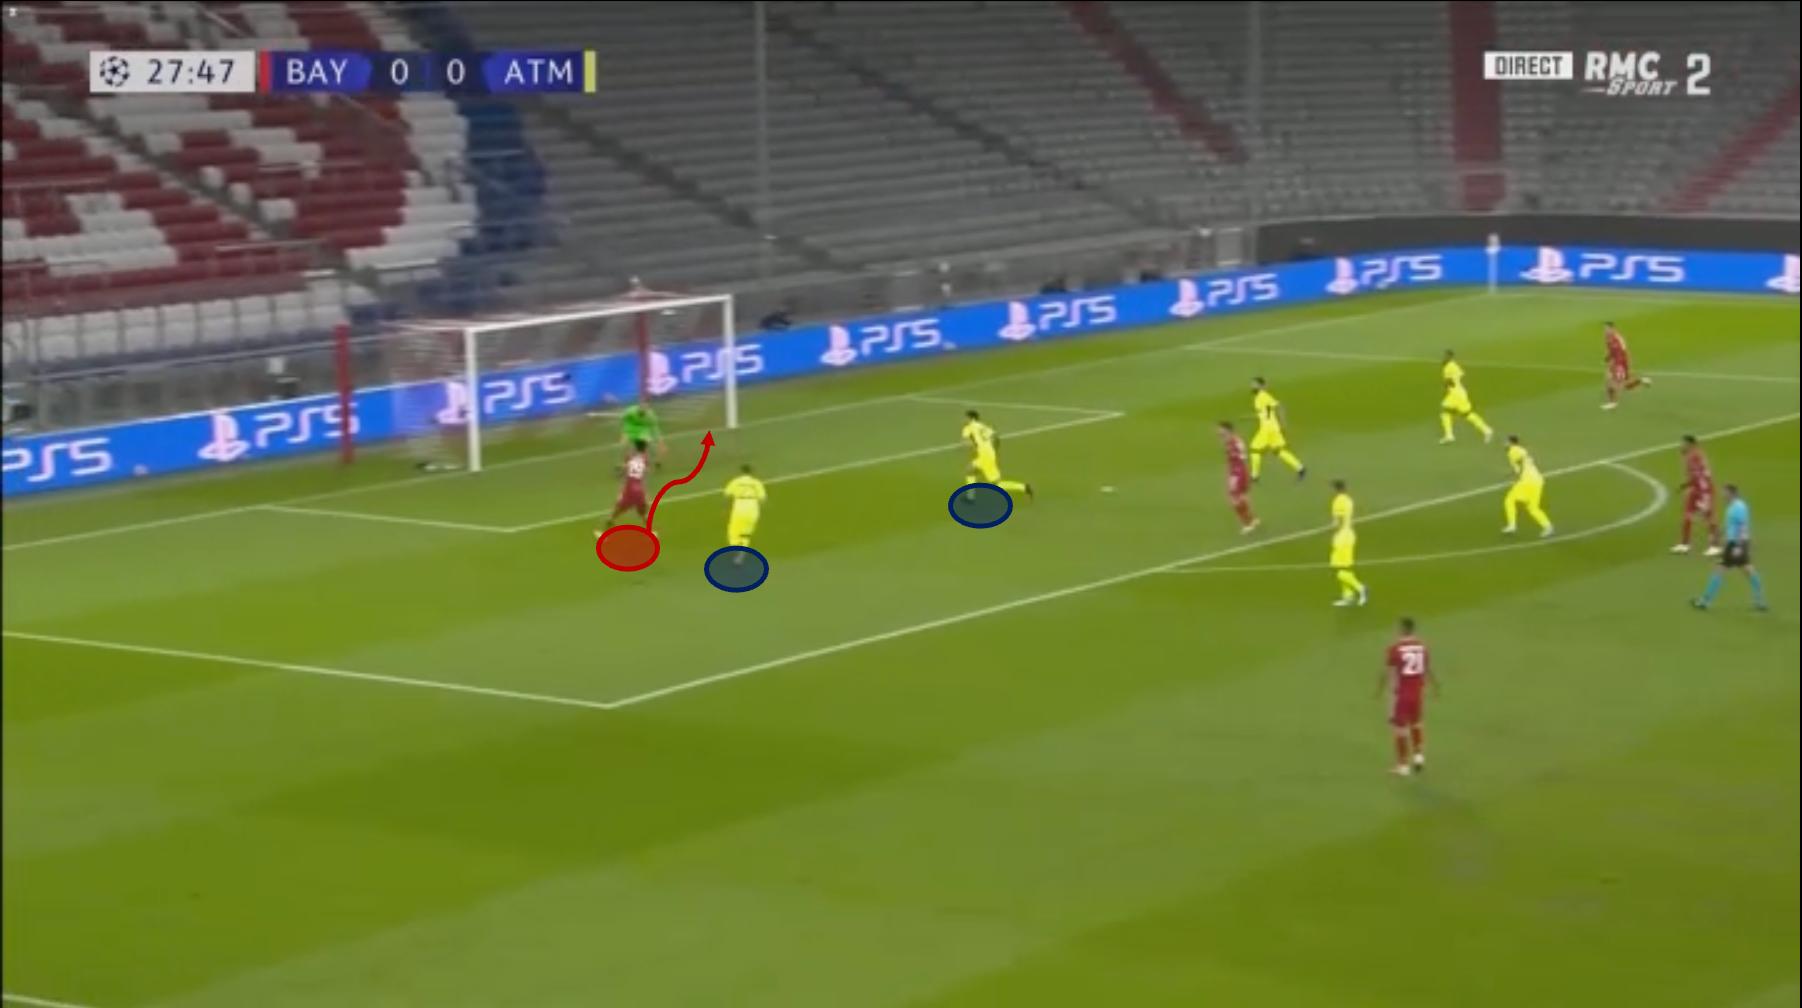 Kingsley Coman at Bayern Munich 2020/21 - scout report - tactical analysis tactics